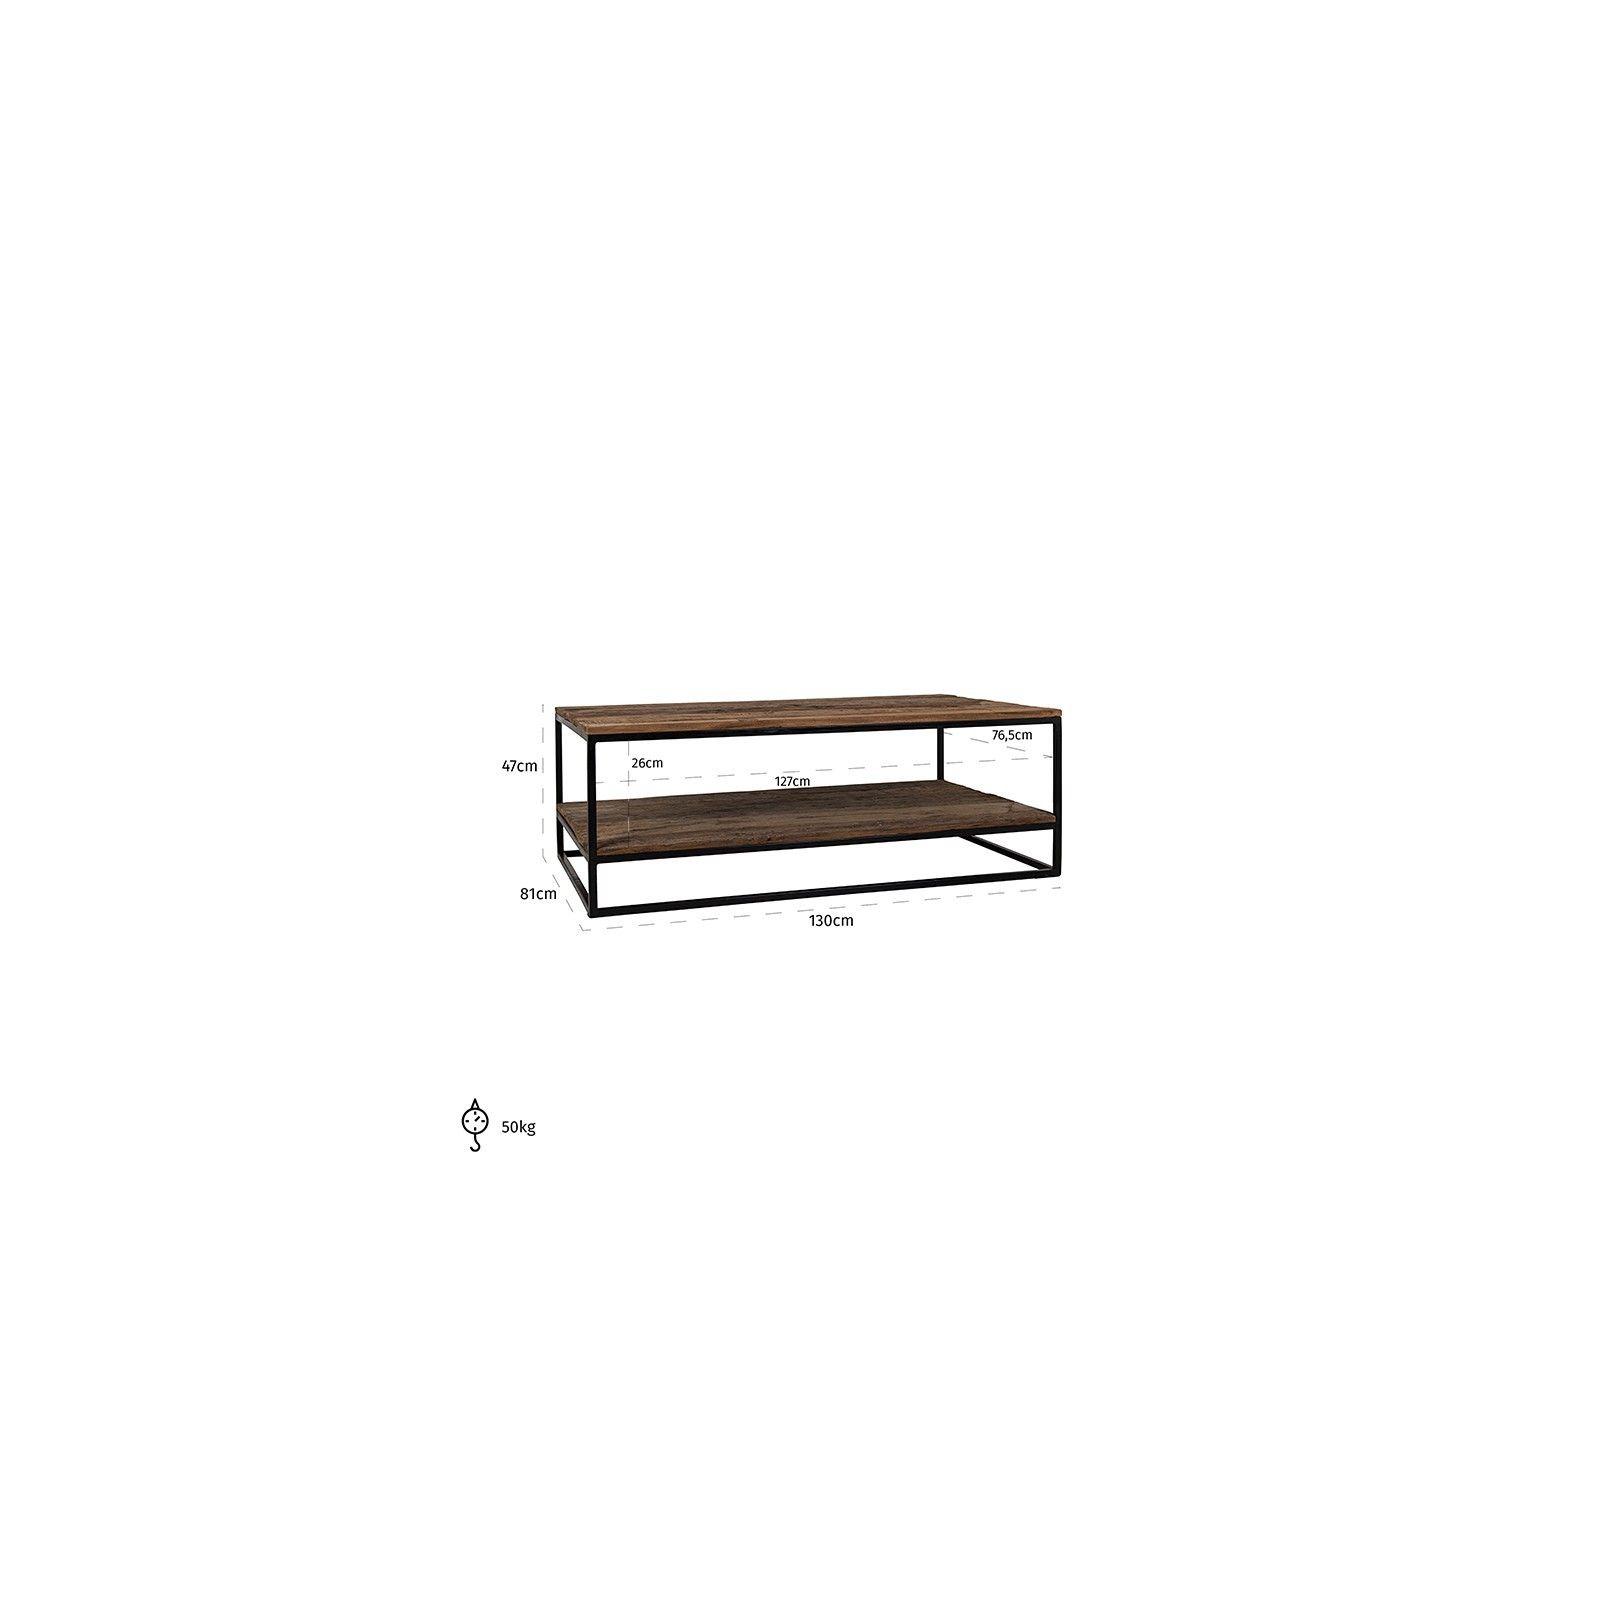 Table de salon Raffles, Recyceld wood Tables basses rectangulaires - 213